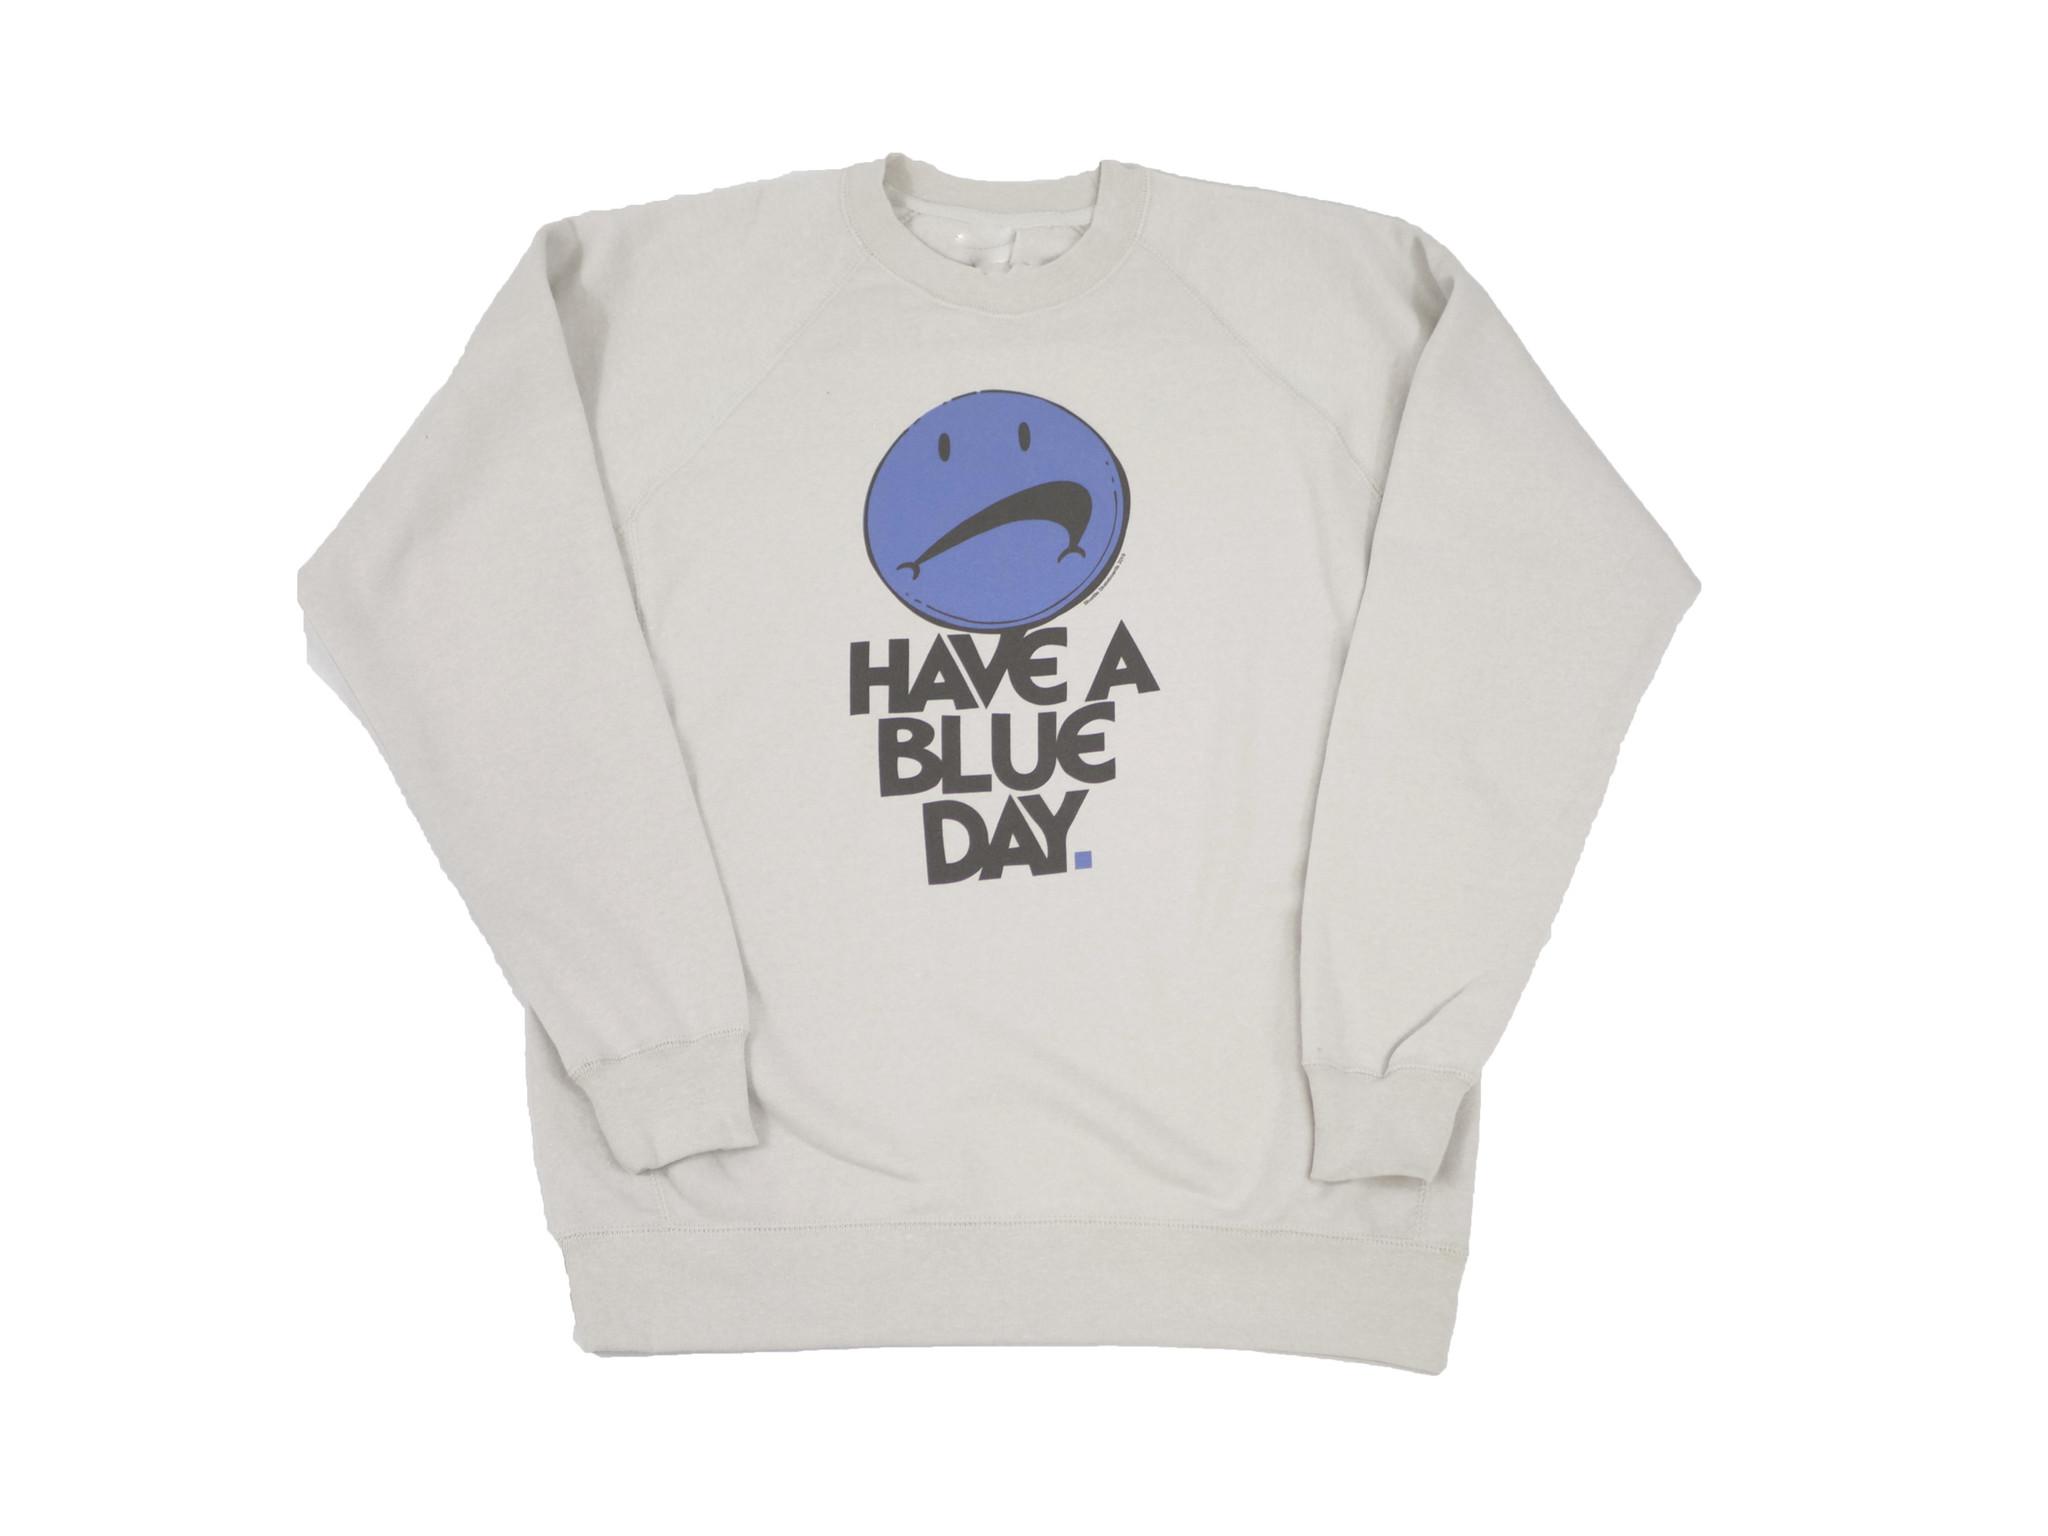 BLUETILE BLUETILE HAVE A BLUE DAY CREWNECK STONE HEATHER